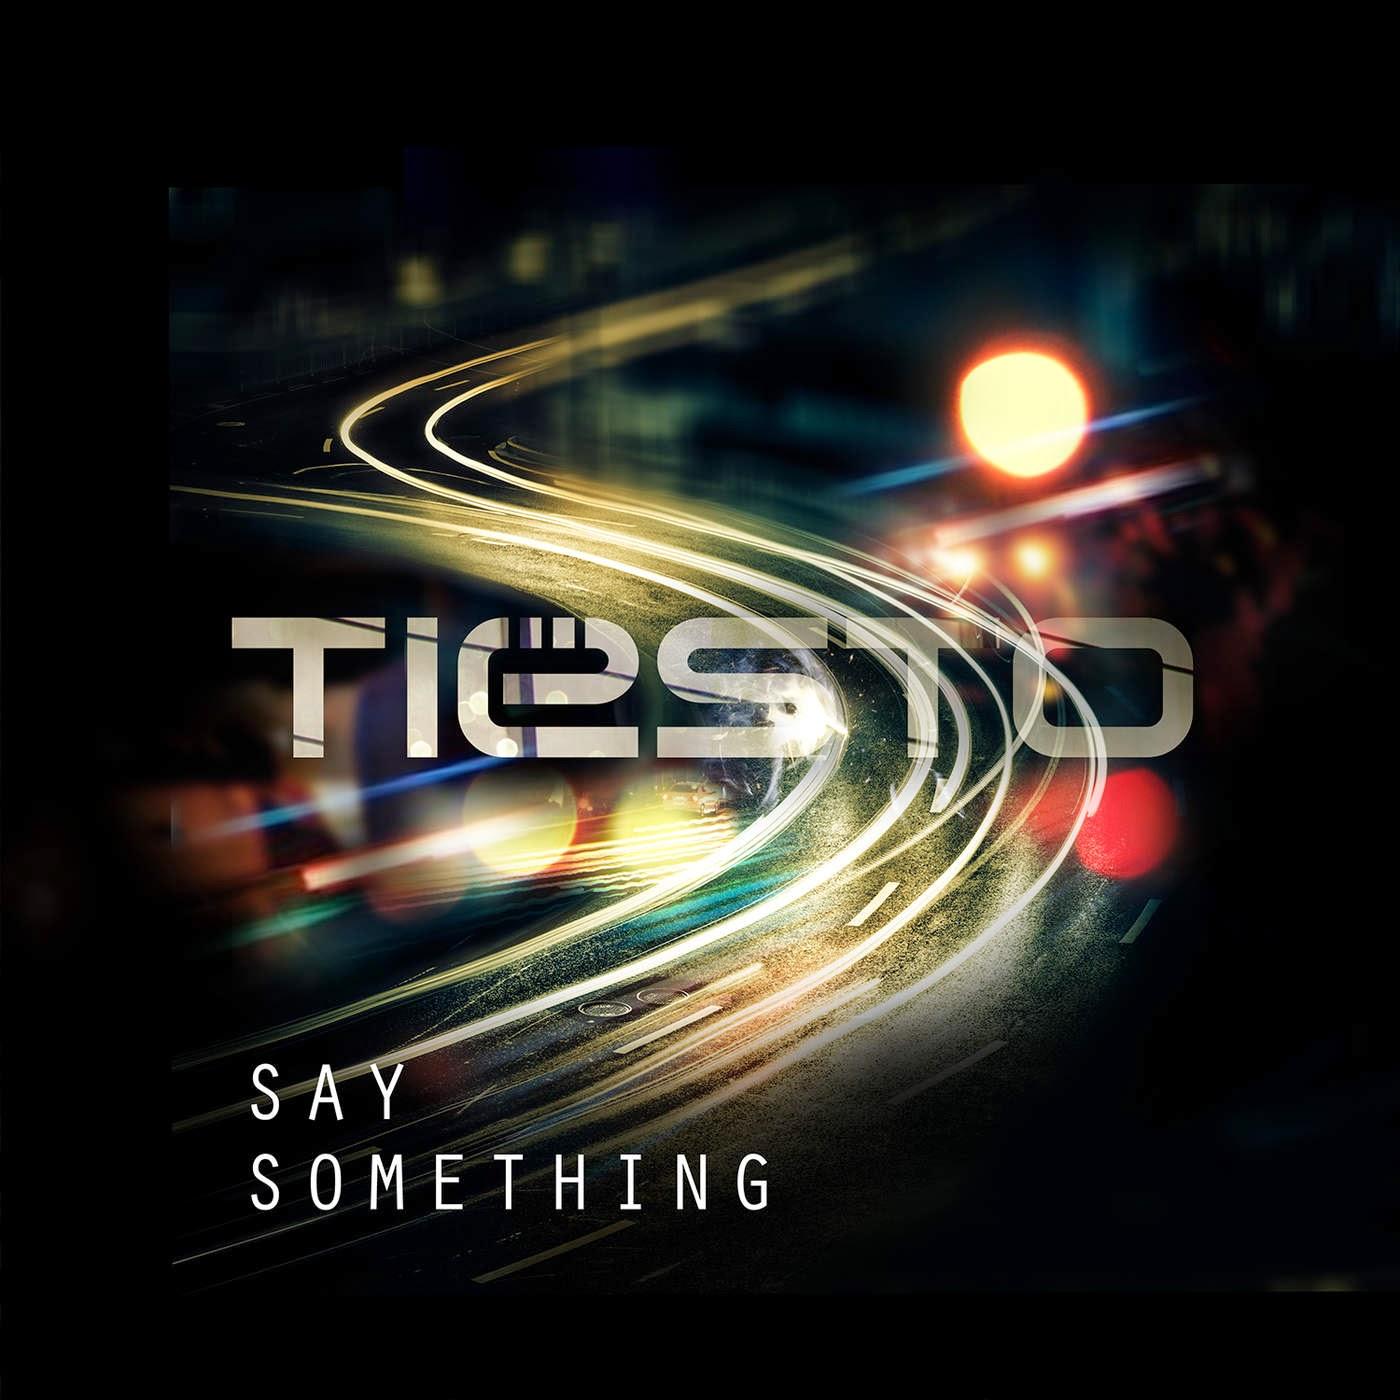 Tiësto - Say Something - Single Cover